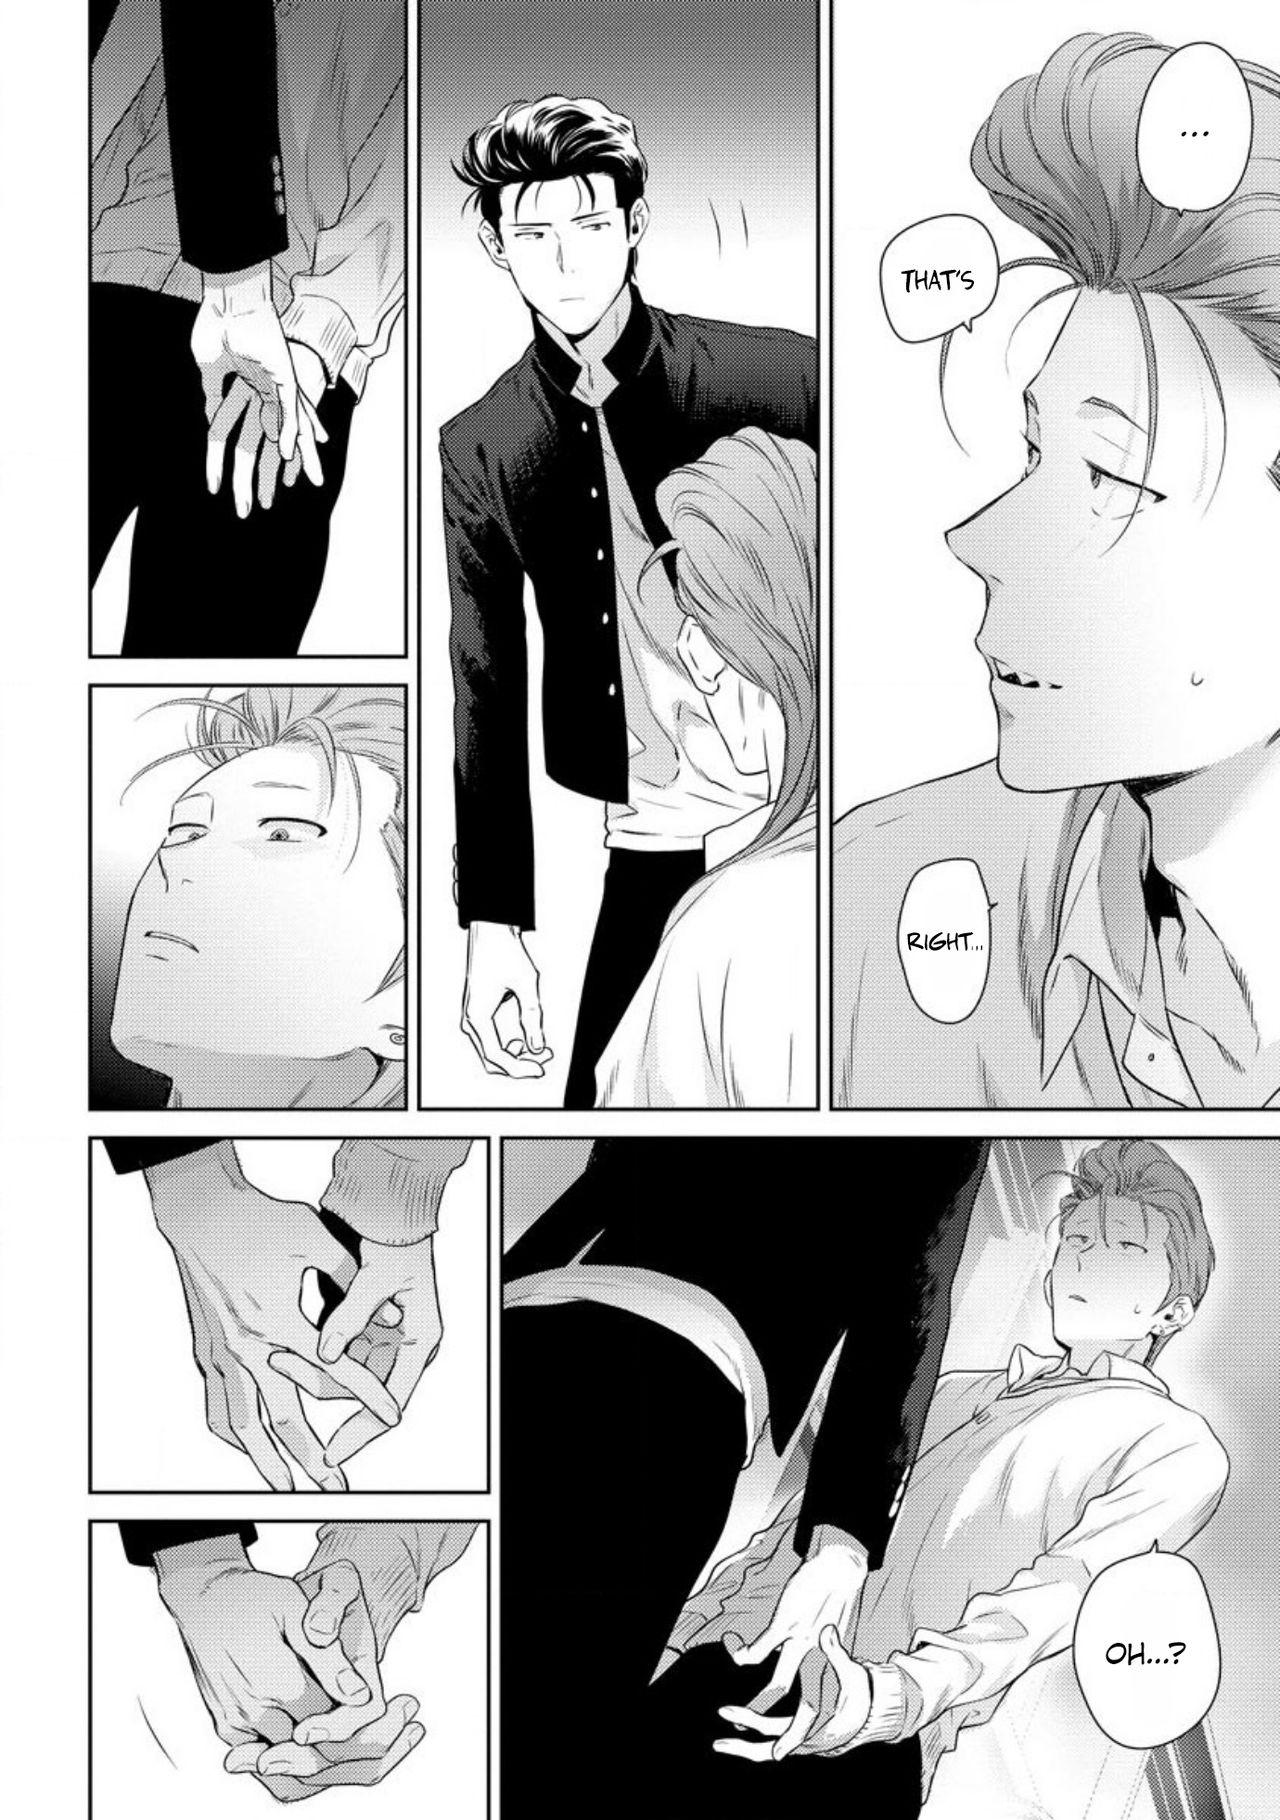 [Hiiragi Nozomu] Nakasete Yaru yo Yankee-kun   I'll Make You Cry Ch. 1-5 + Extras [English] [Digital] 63